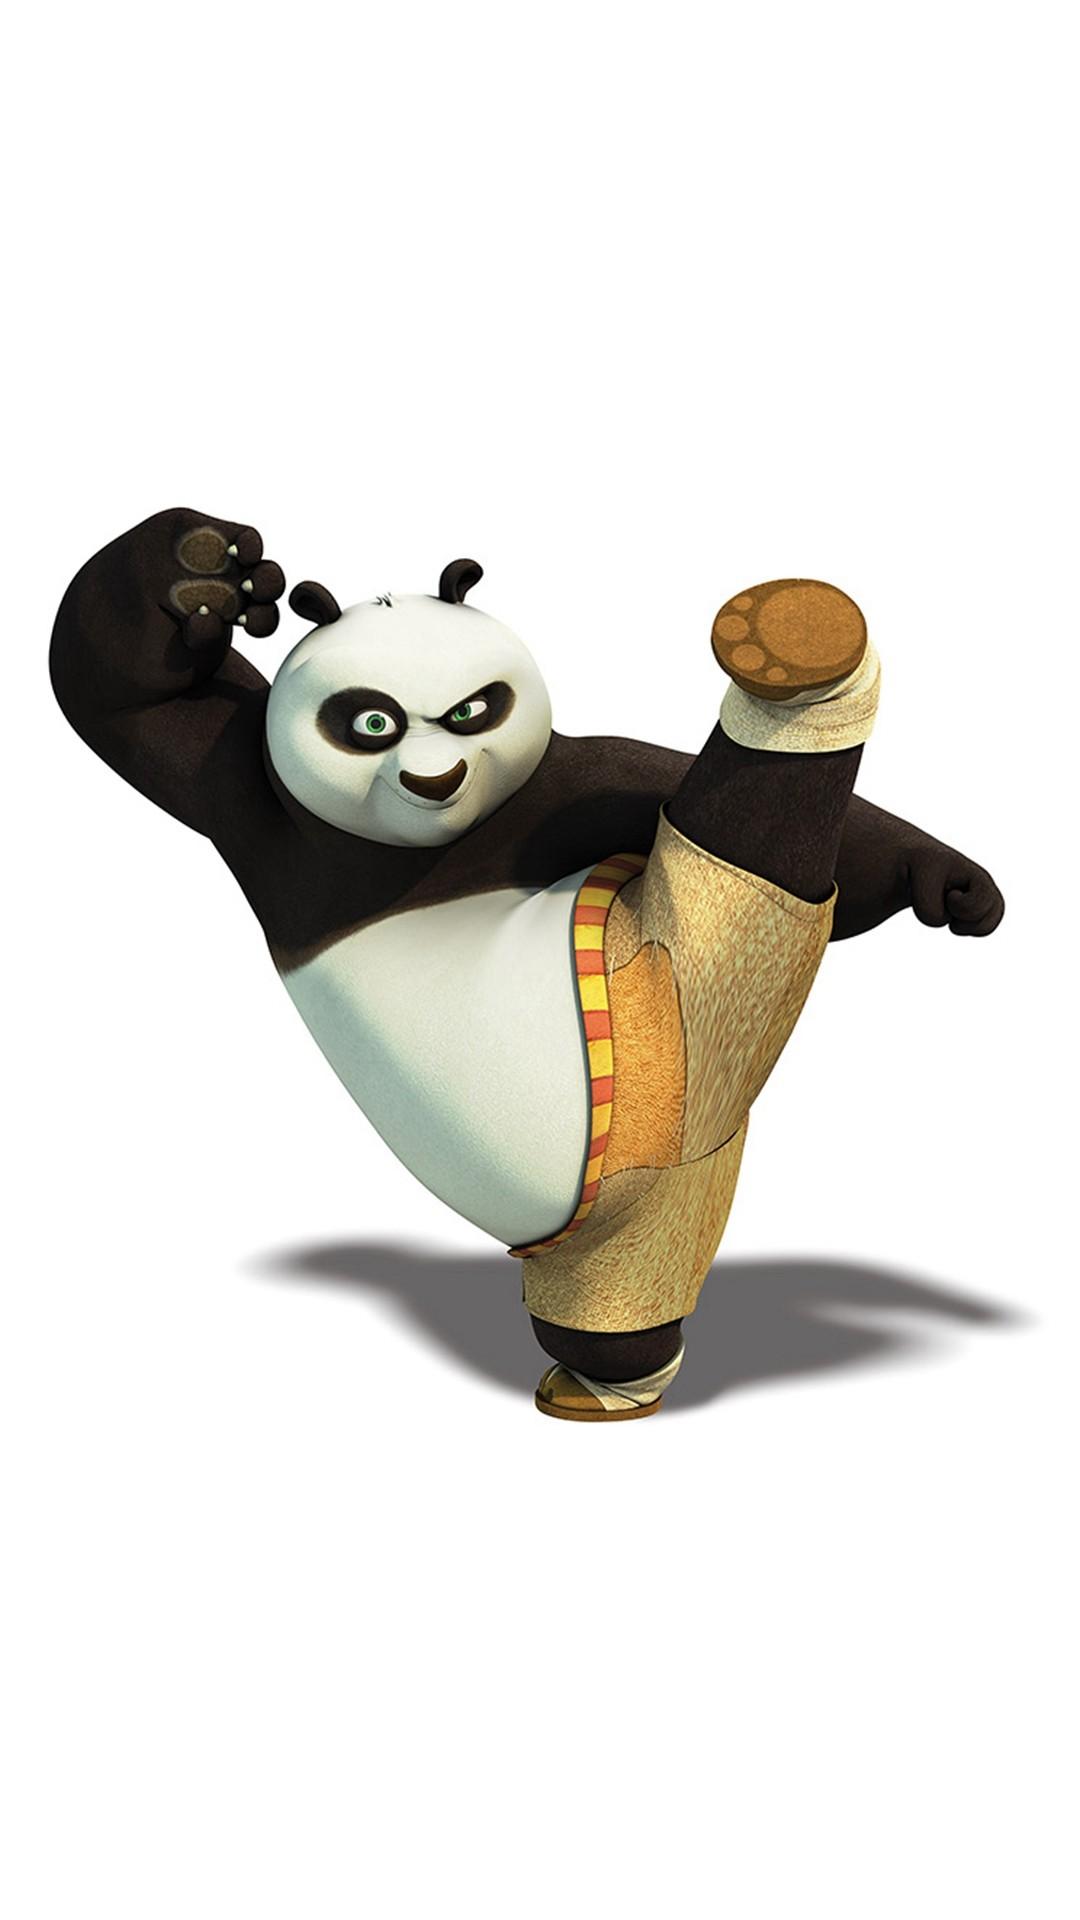 Kungfu Panda Dreamworks Animal Kick Cute Anime iPhone 8 wallpaper